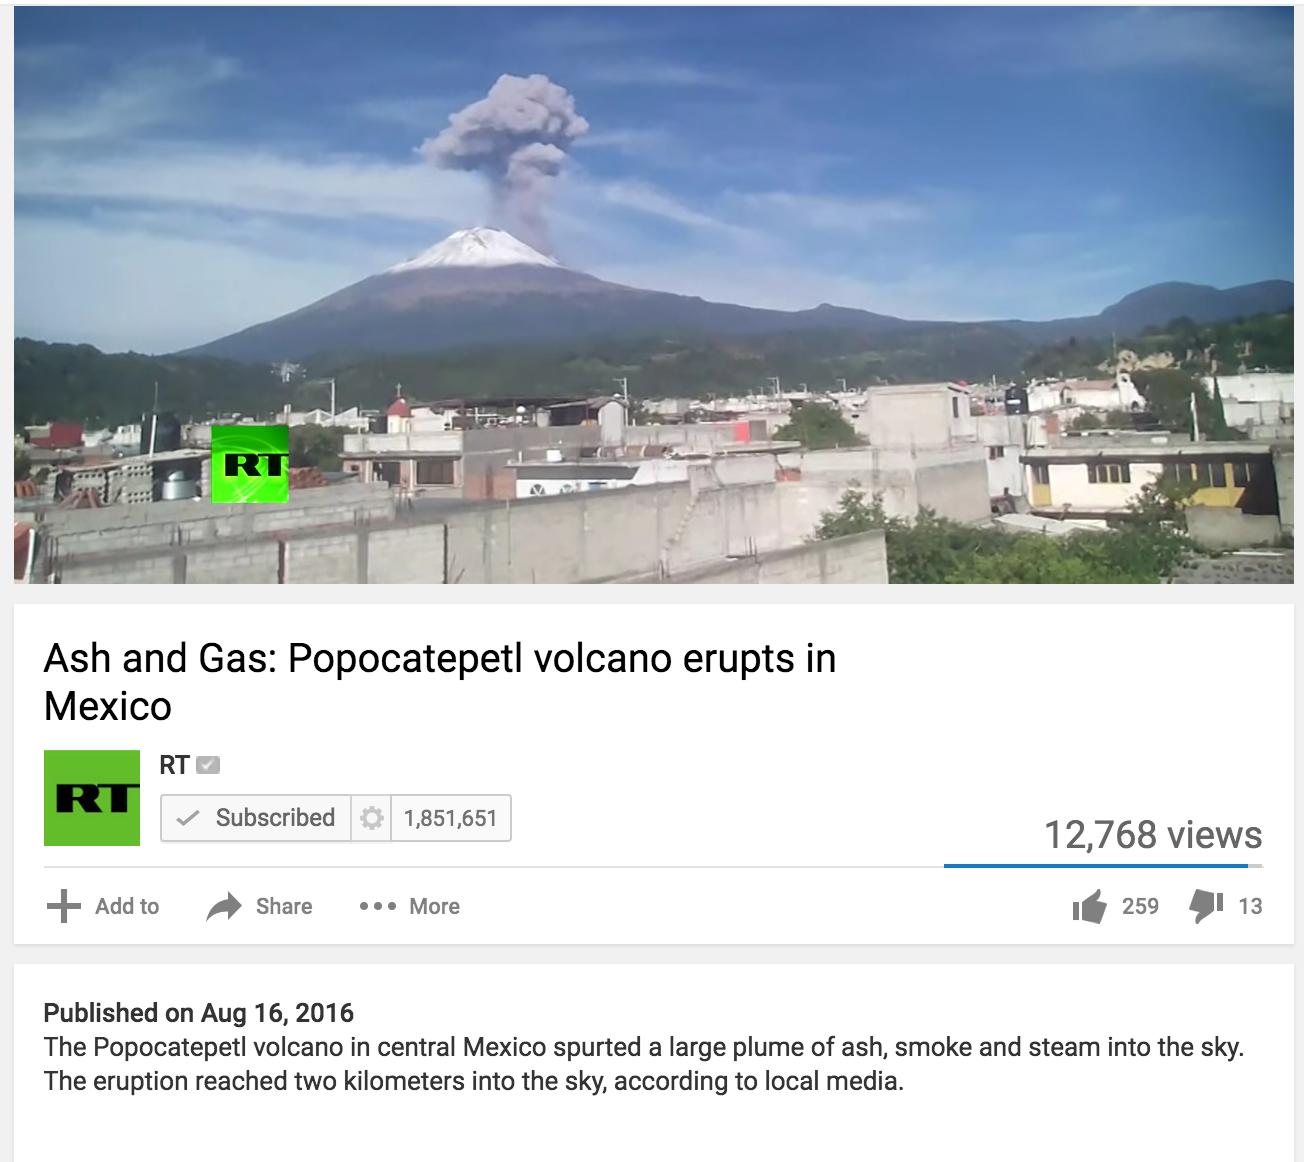 Popo Erupts RT AUG16 2016Screen Shot 2016-08-19 at 21.39.00